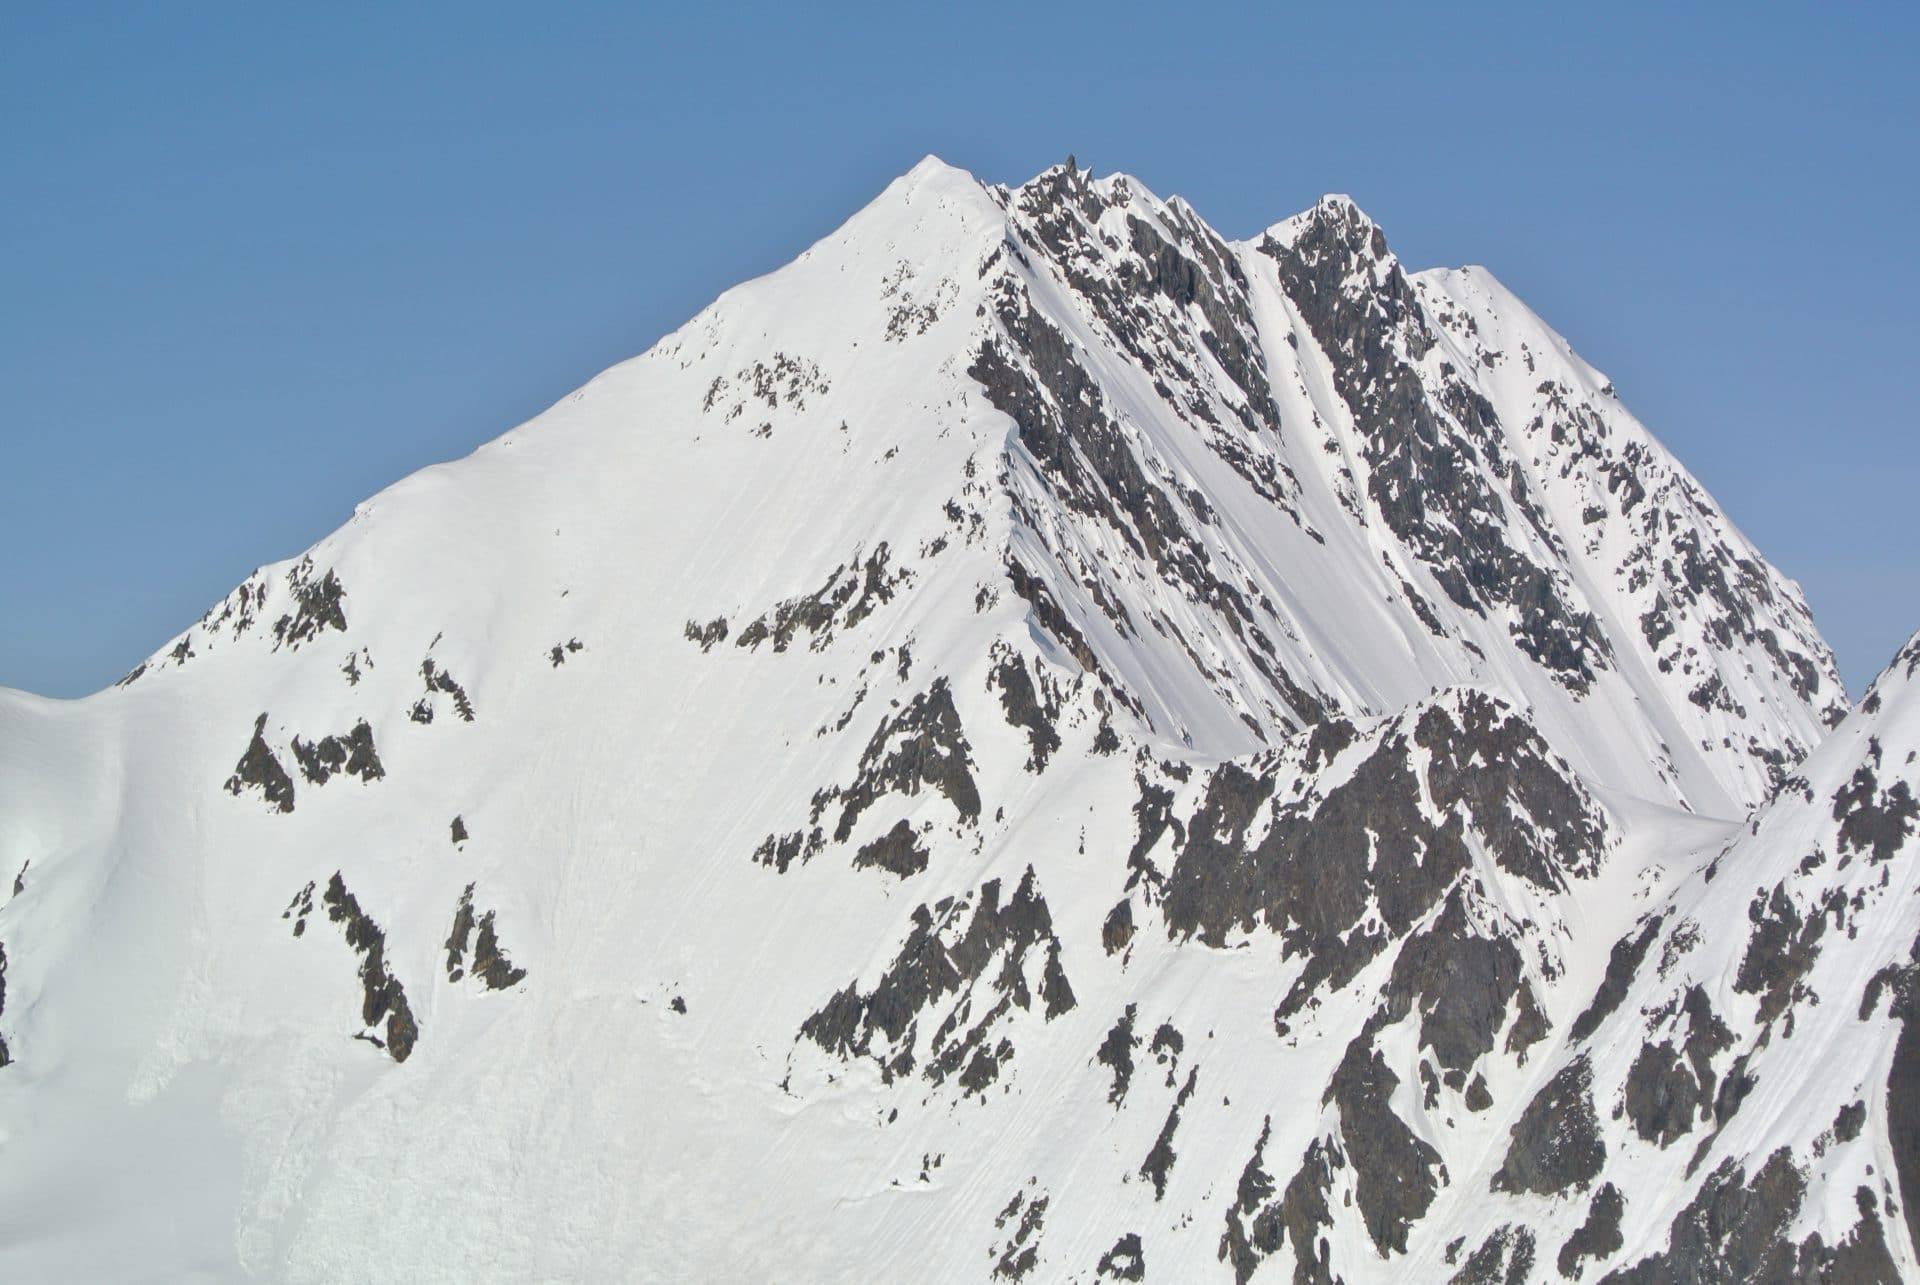 Helyum_Xavier-Carrard_Guide-de-montagne_Ski_Alaska_Saphire-Peak_Thomson-Pass